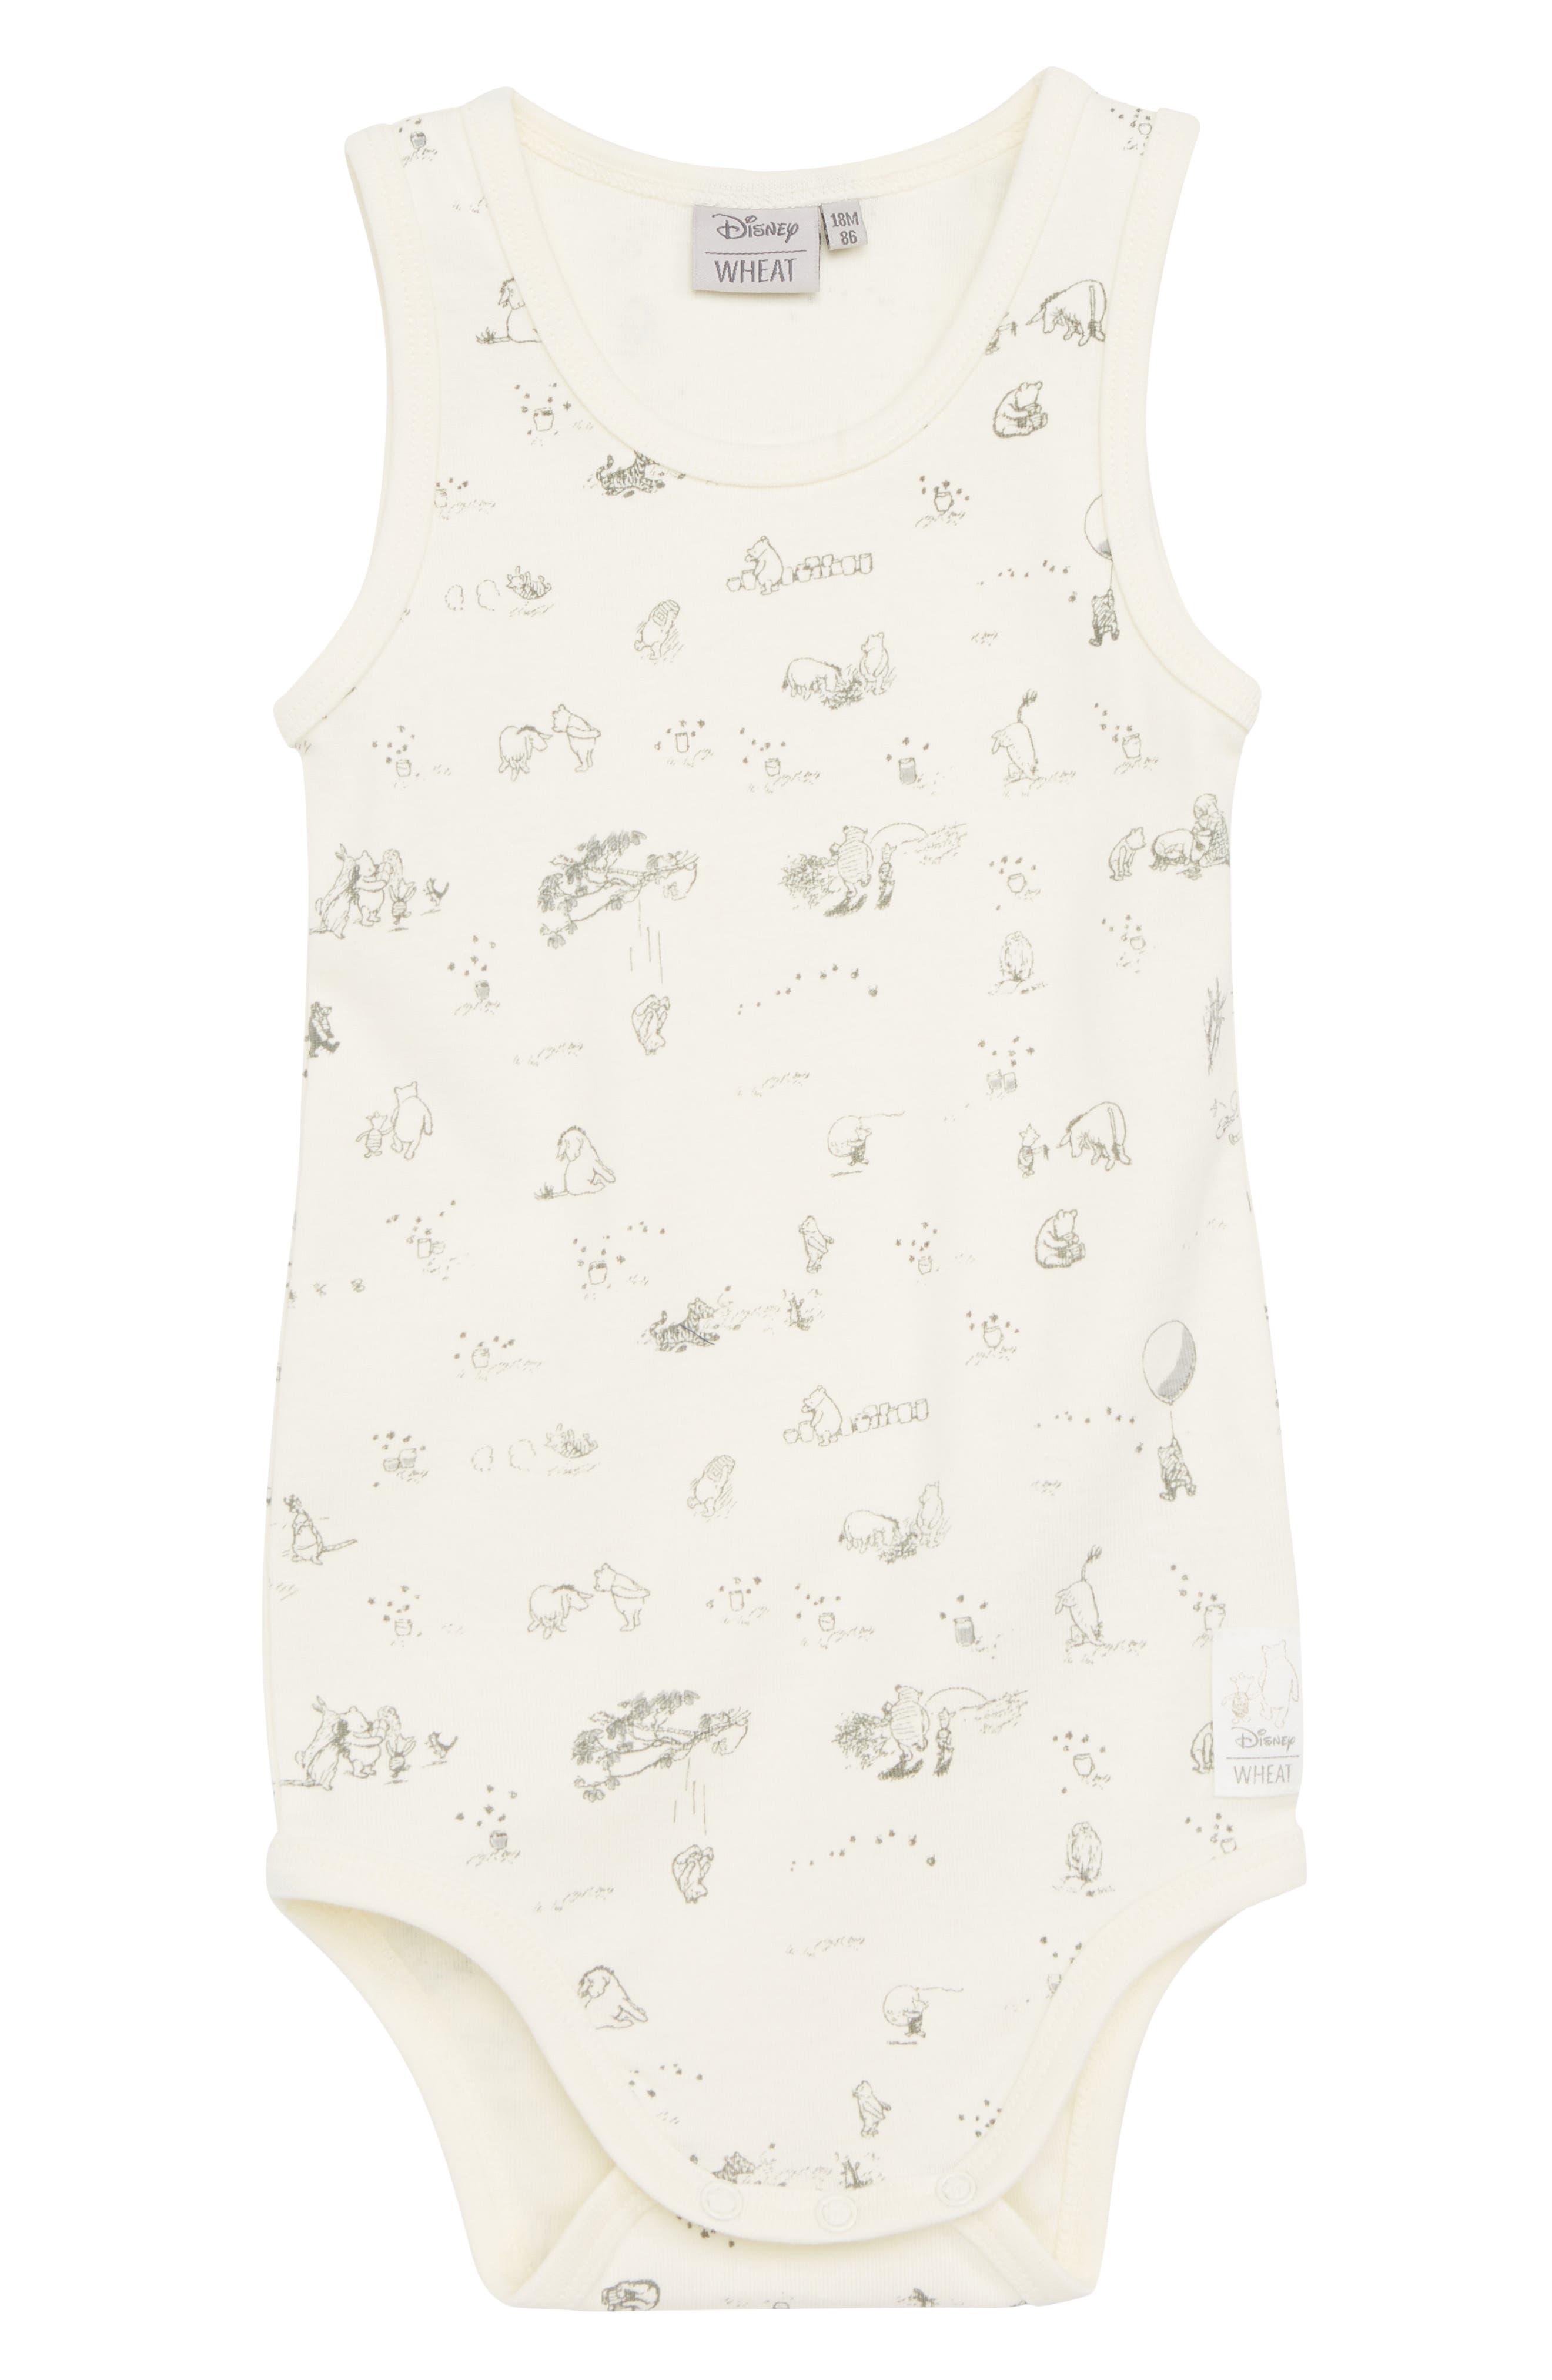 x Disney<sup>®</sup> Winnie the Pooh Organic Cotton Bodysuit,                         Main,                         color, 902